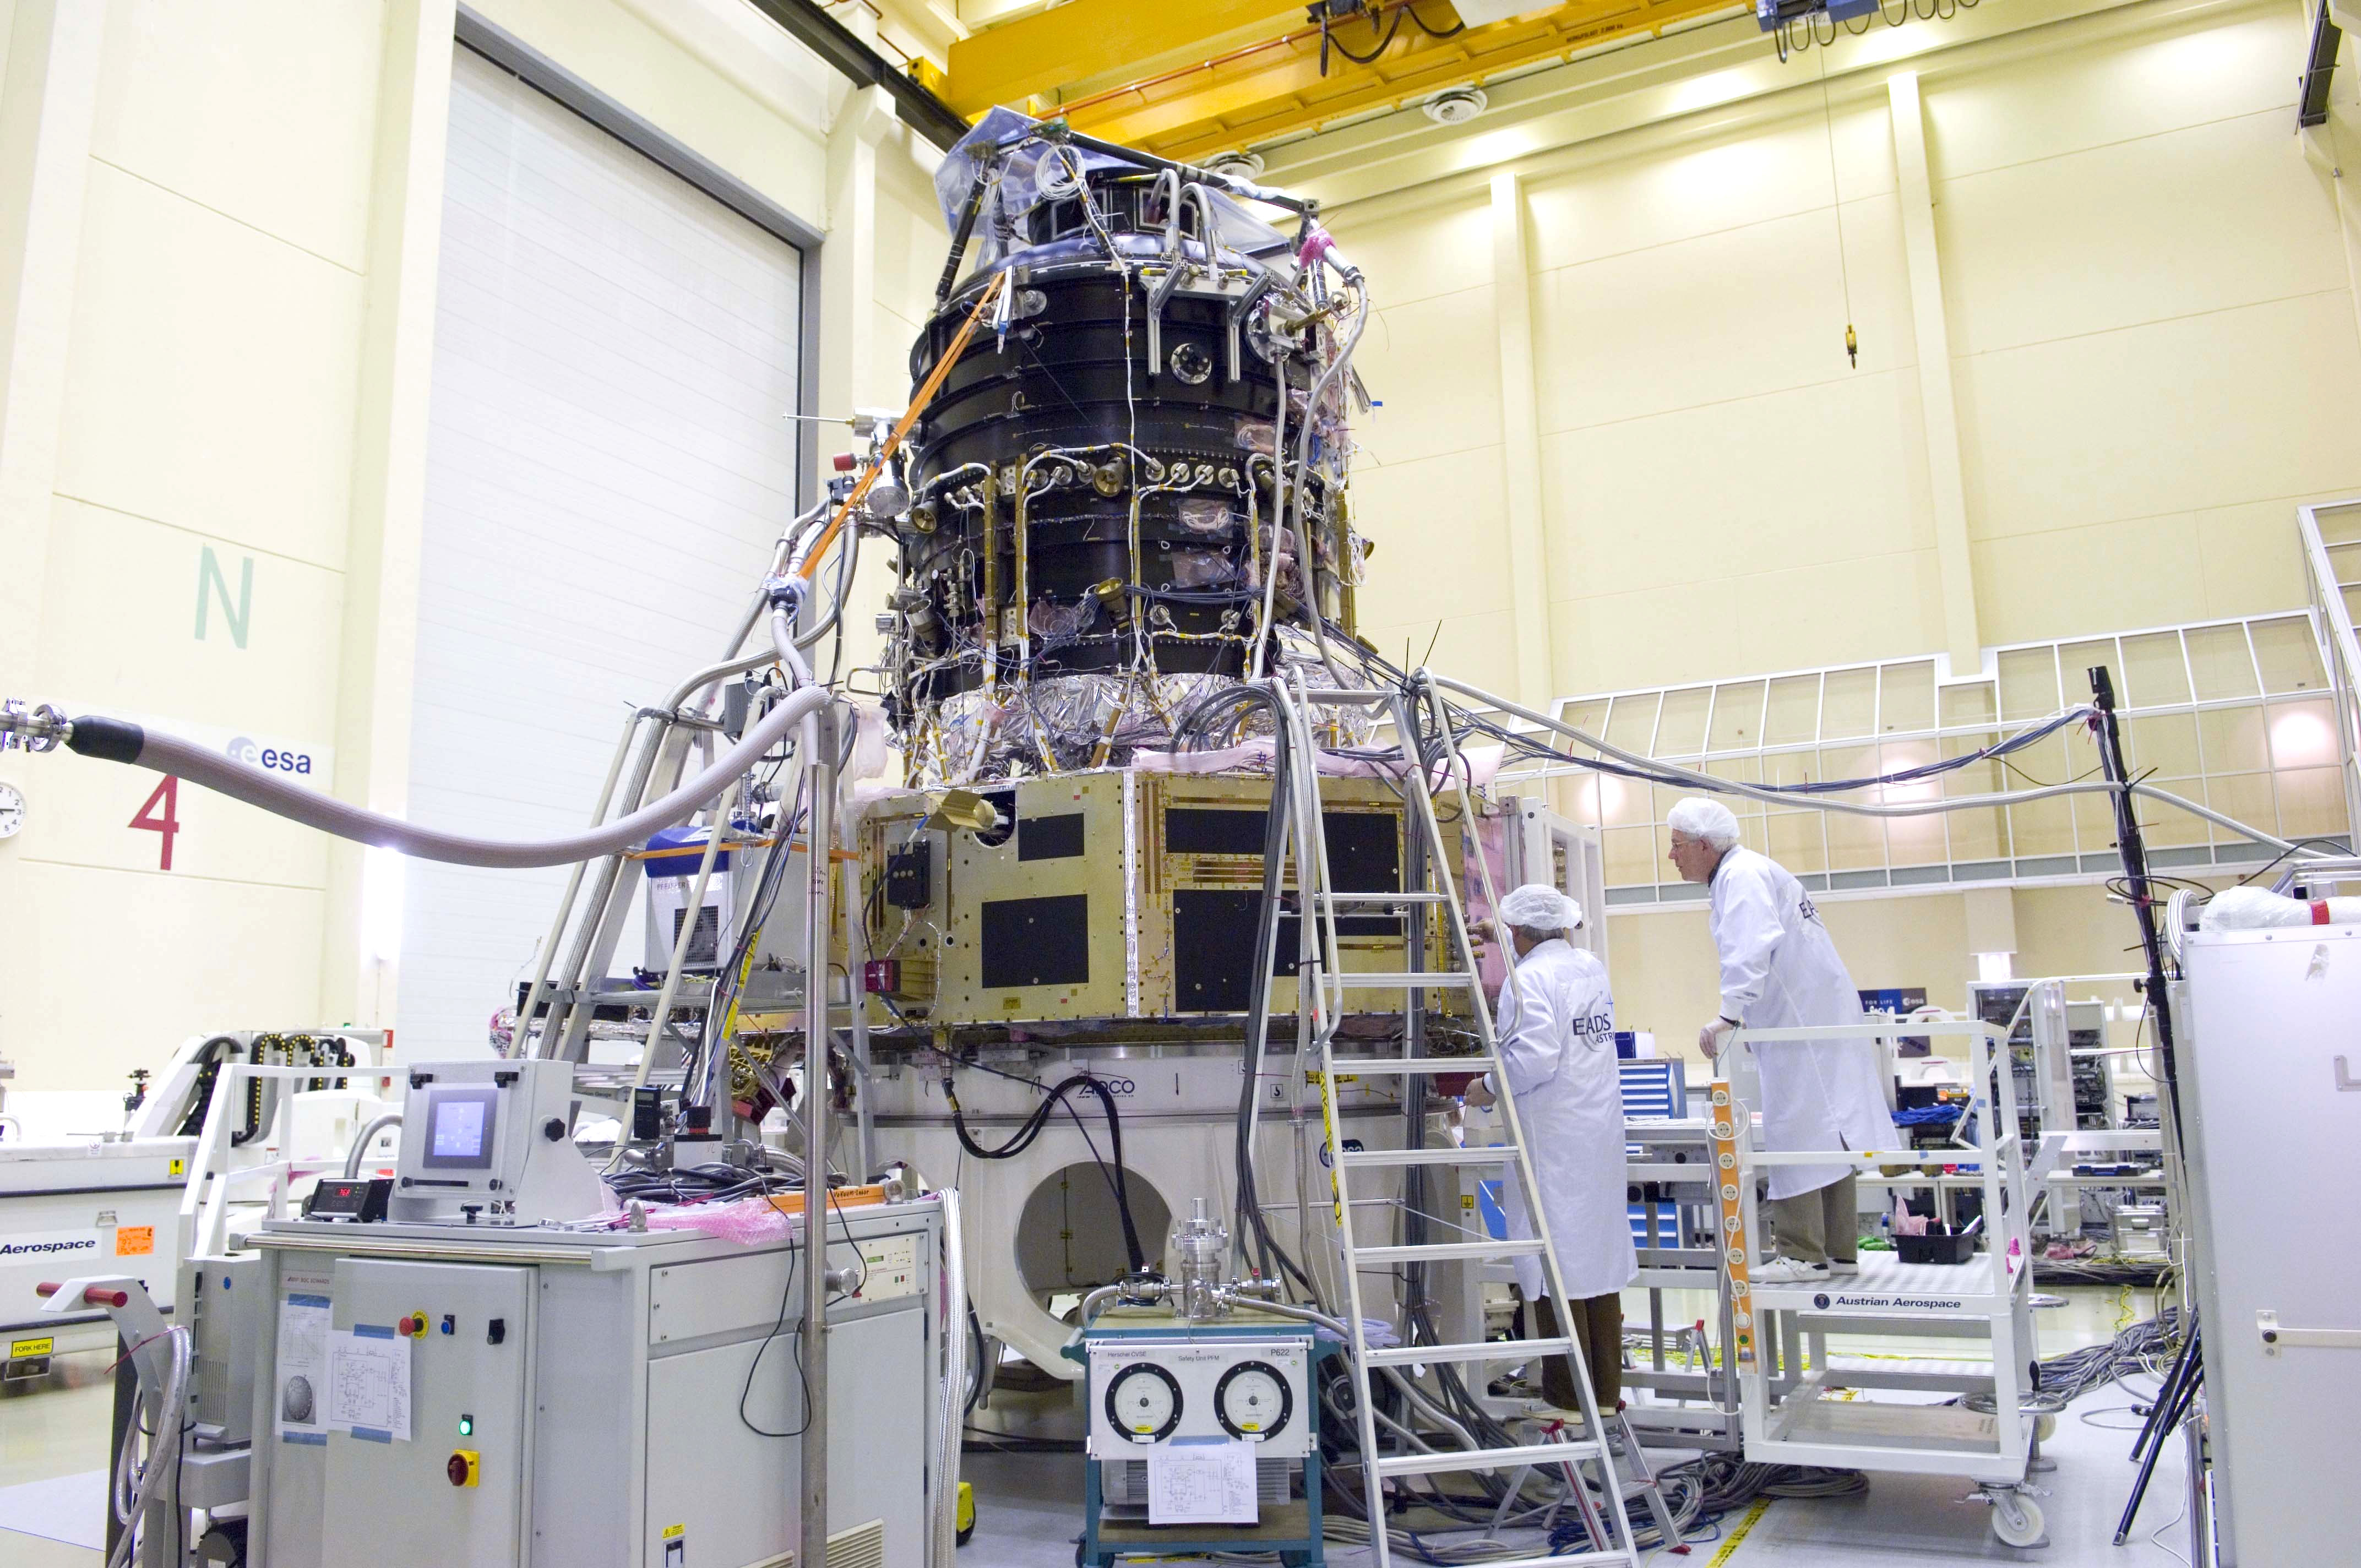 Herschel cryostat cool-down setup